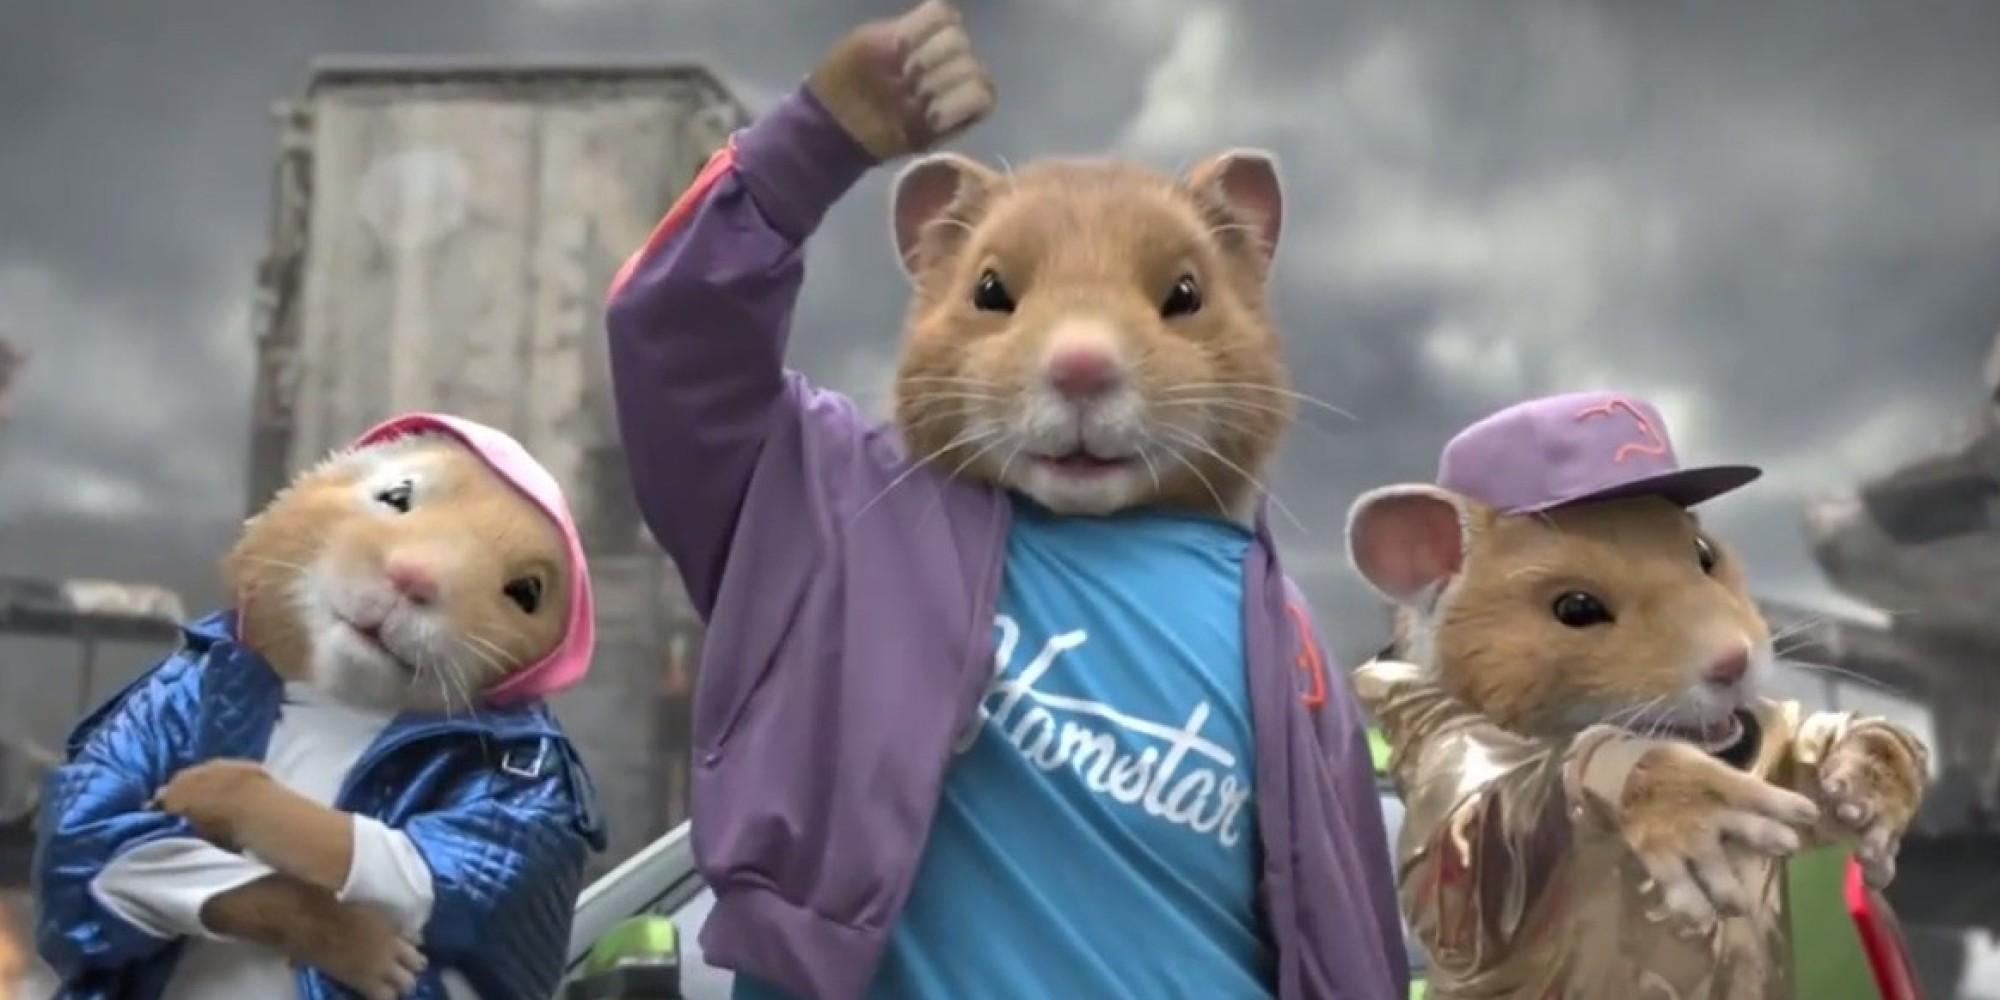 kia hamster dancer leroy barnes charged with disability